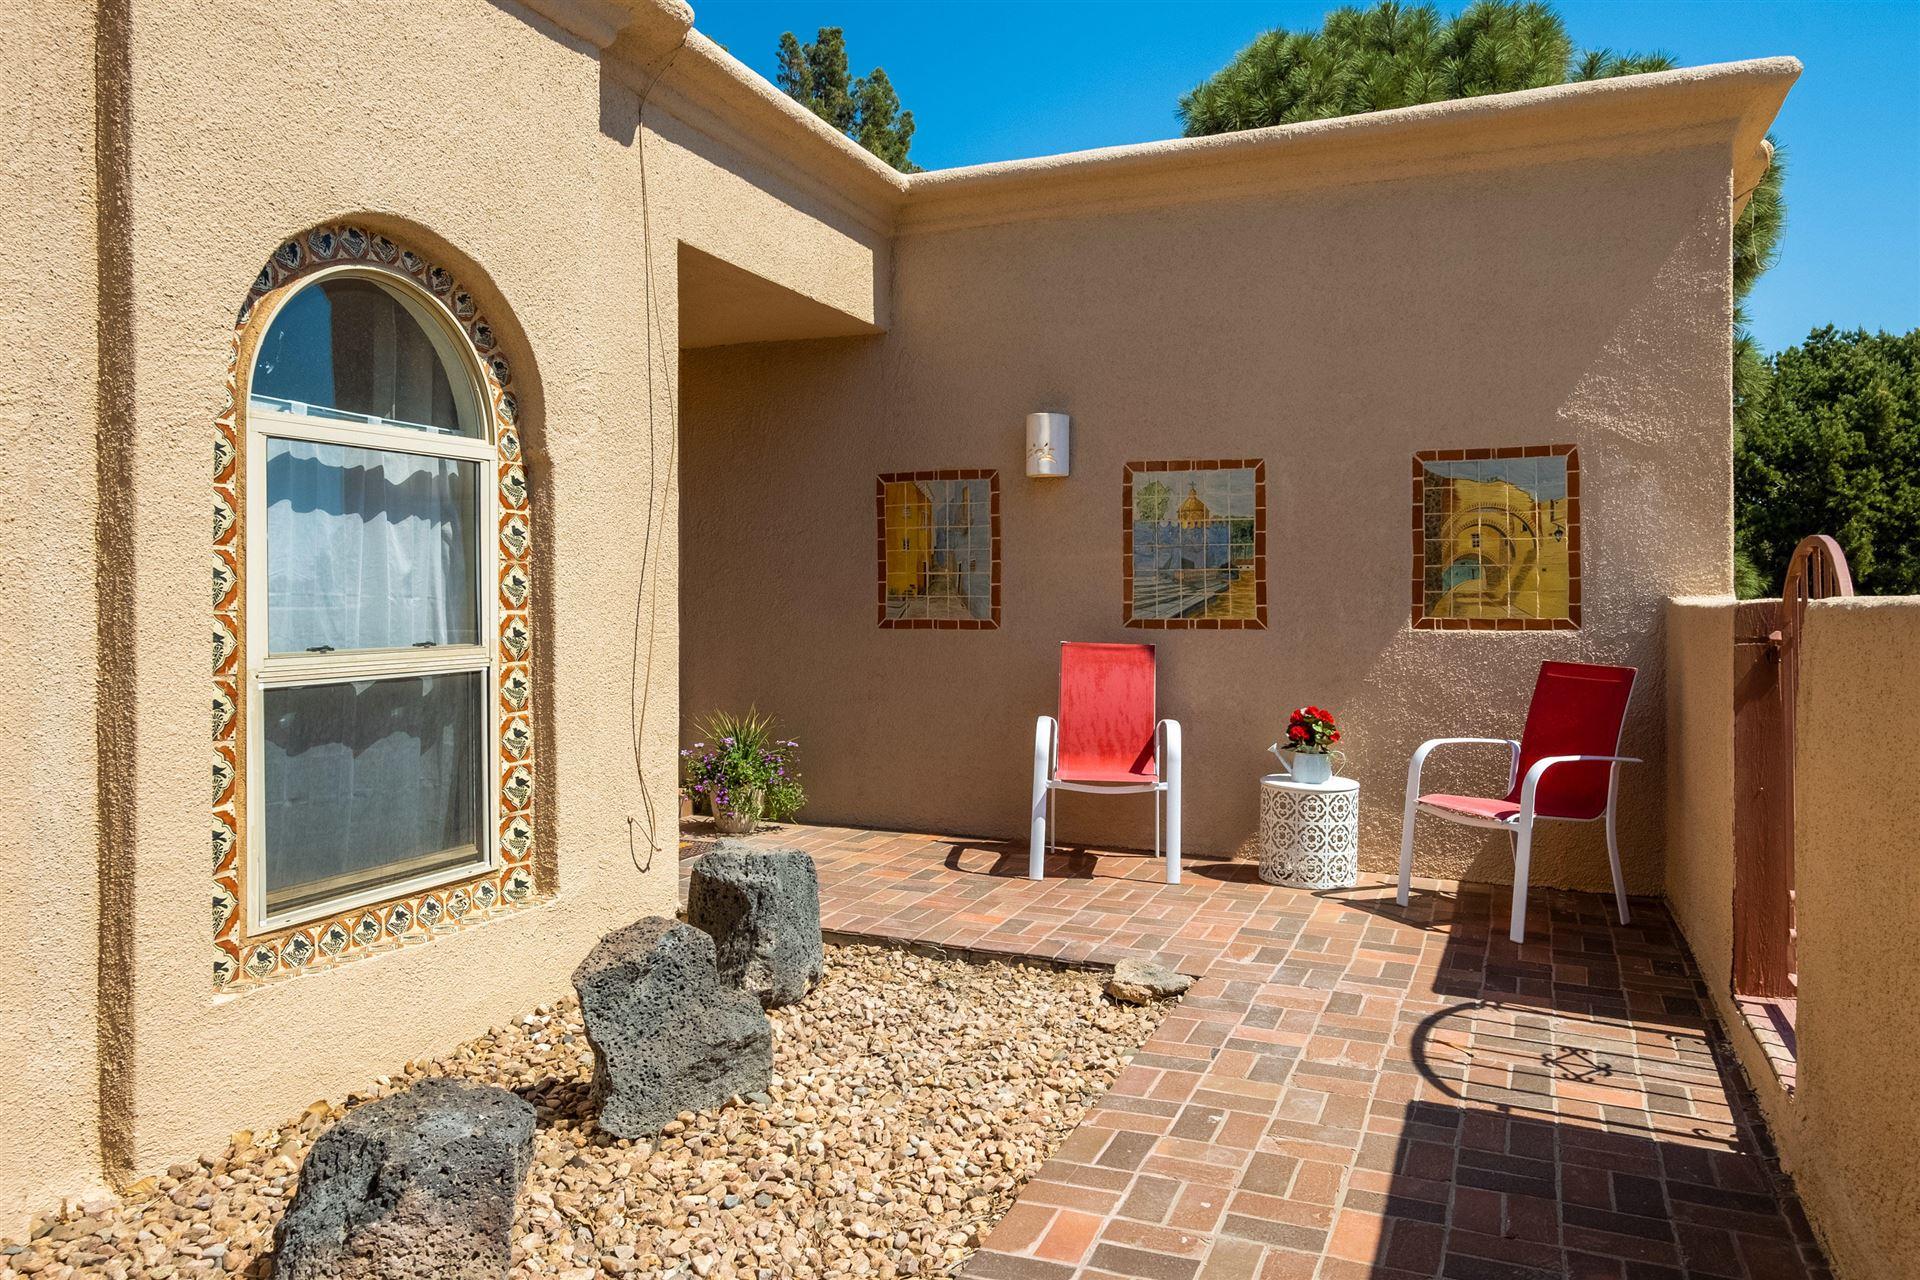 Photo of 9699 Asbury Street NW, Albuquerque, NM 87114 (MLS # 994779)